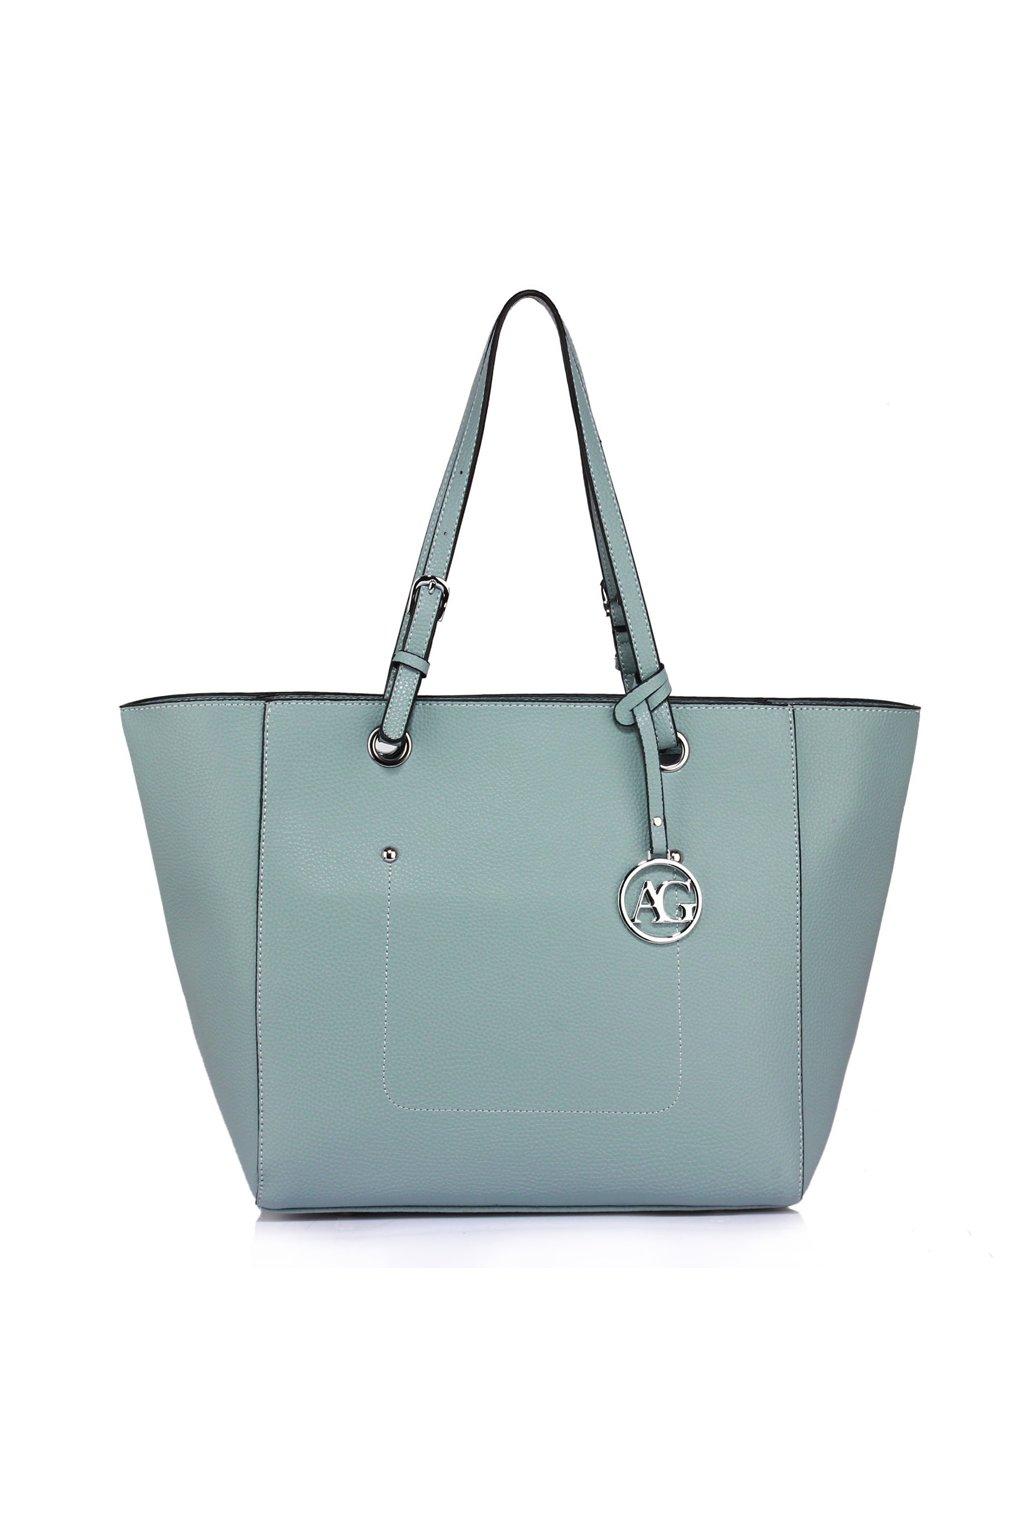 Modrá kabelka na rameno Stacy AG00532  de6e01451be